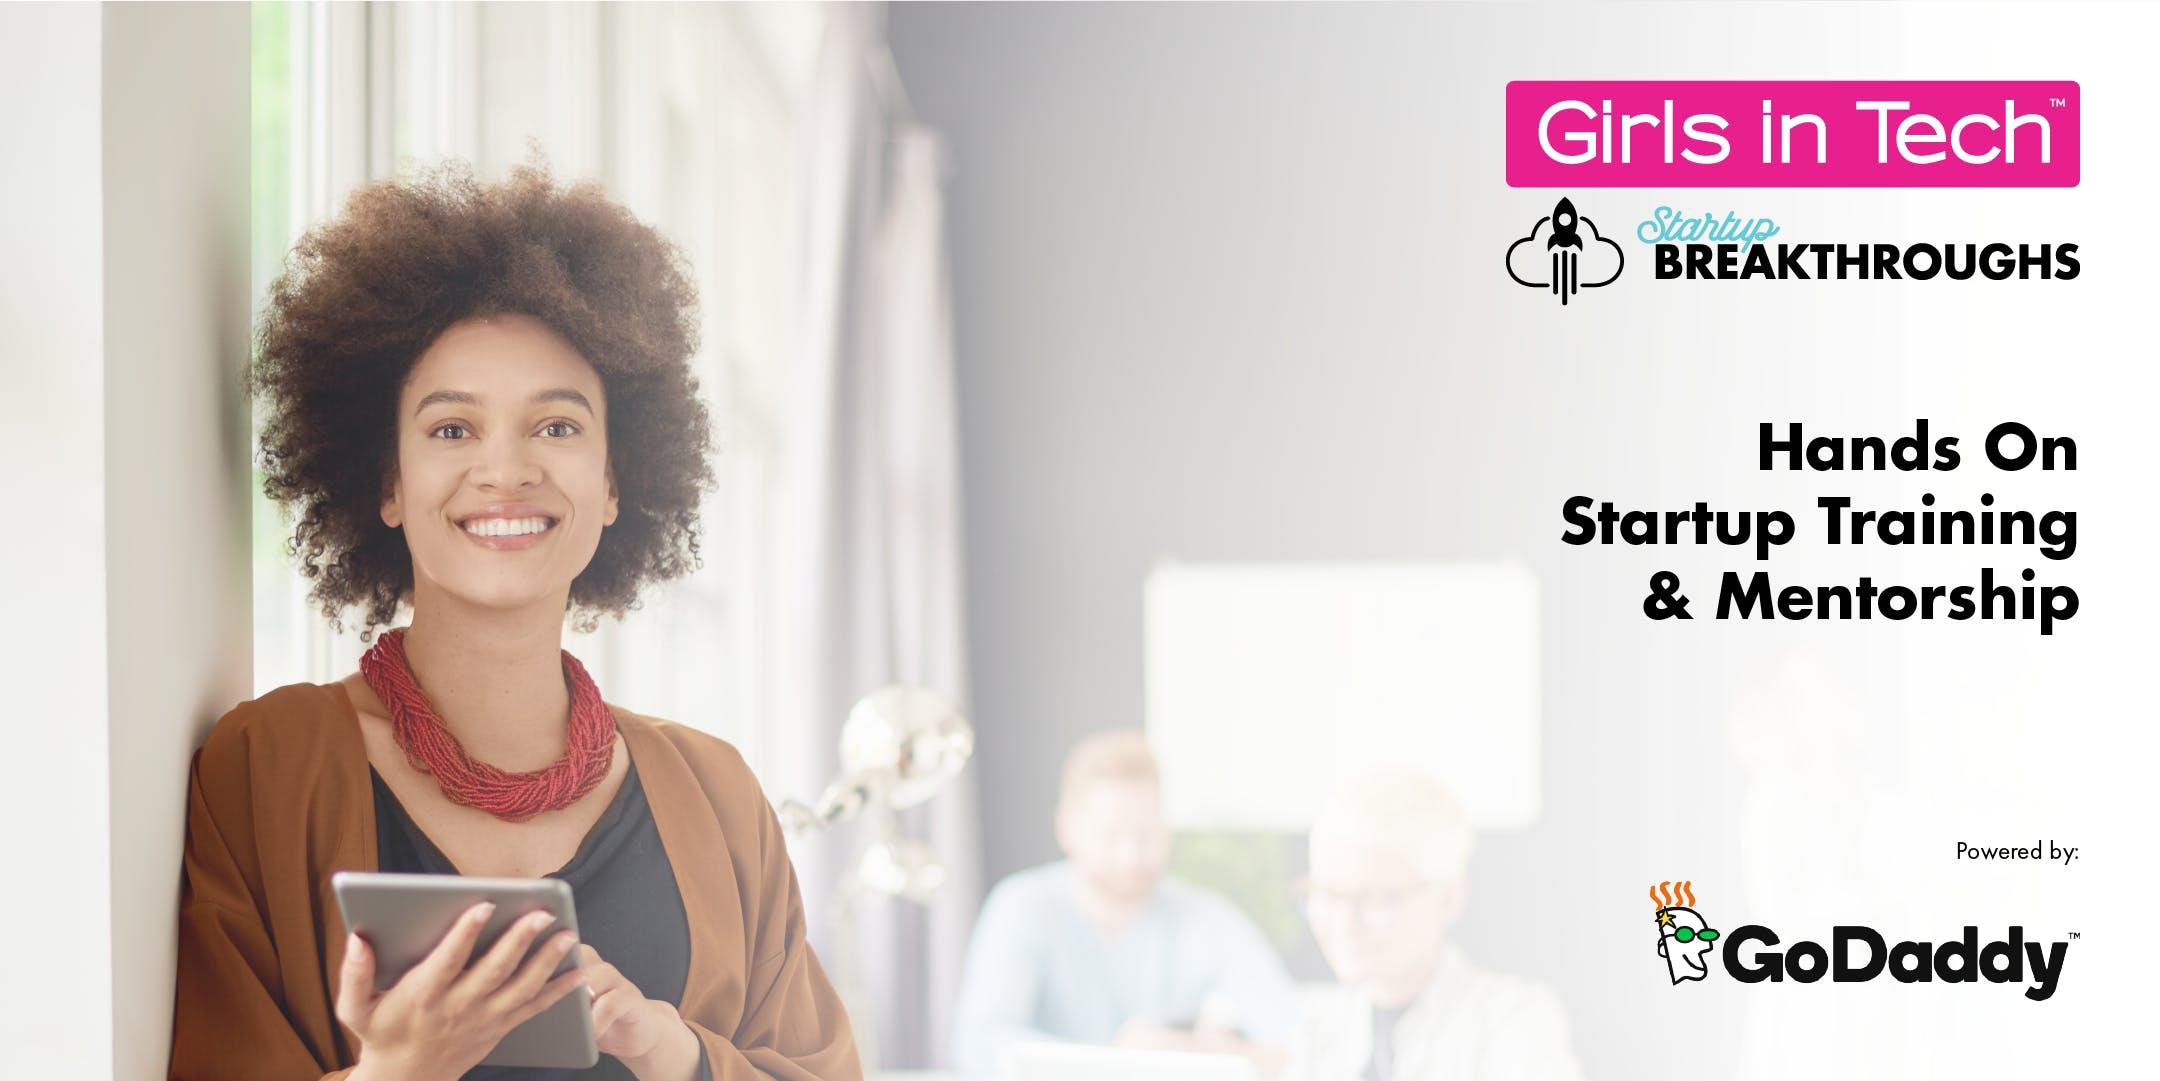 Girls in Tech & Startup Breakthroughs sponsored by GoDaddy